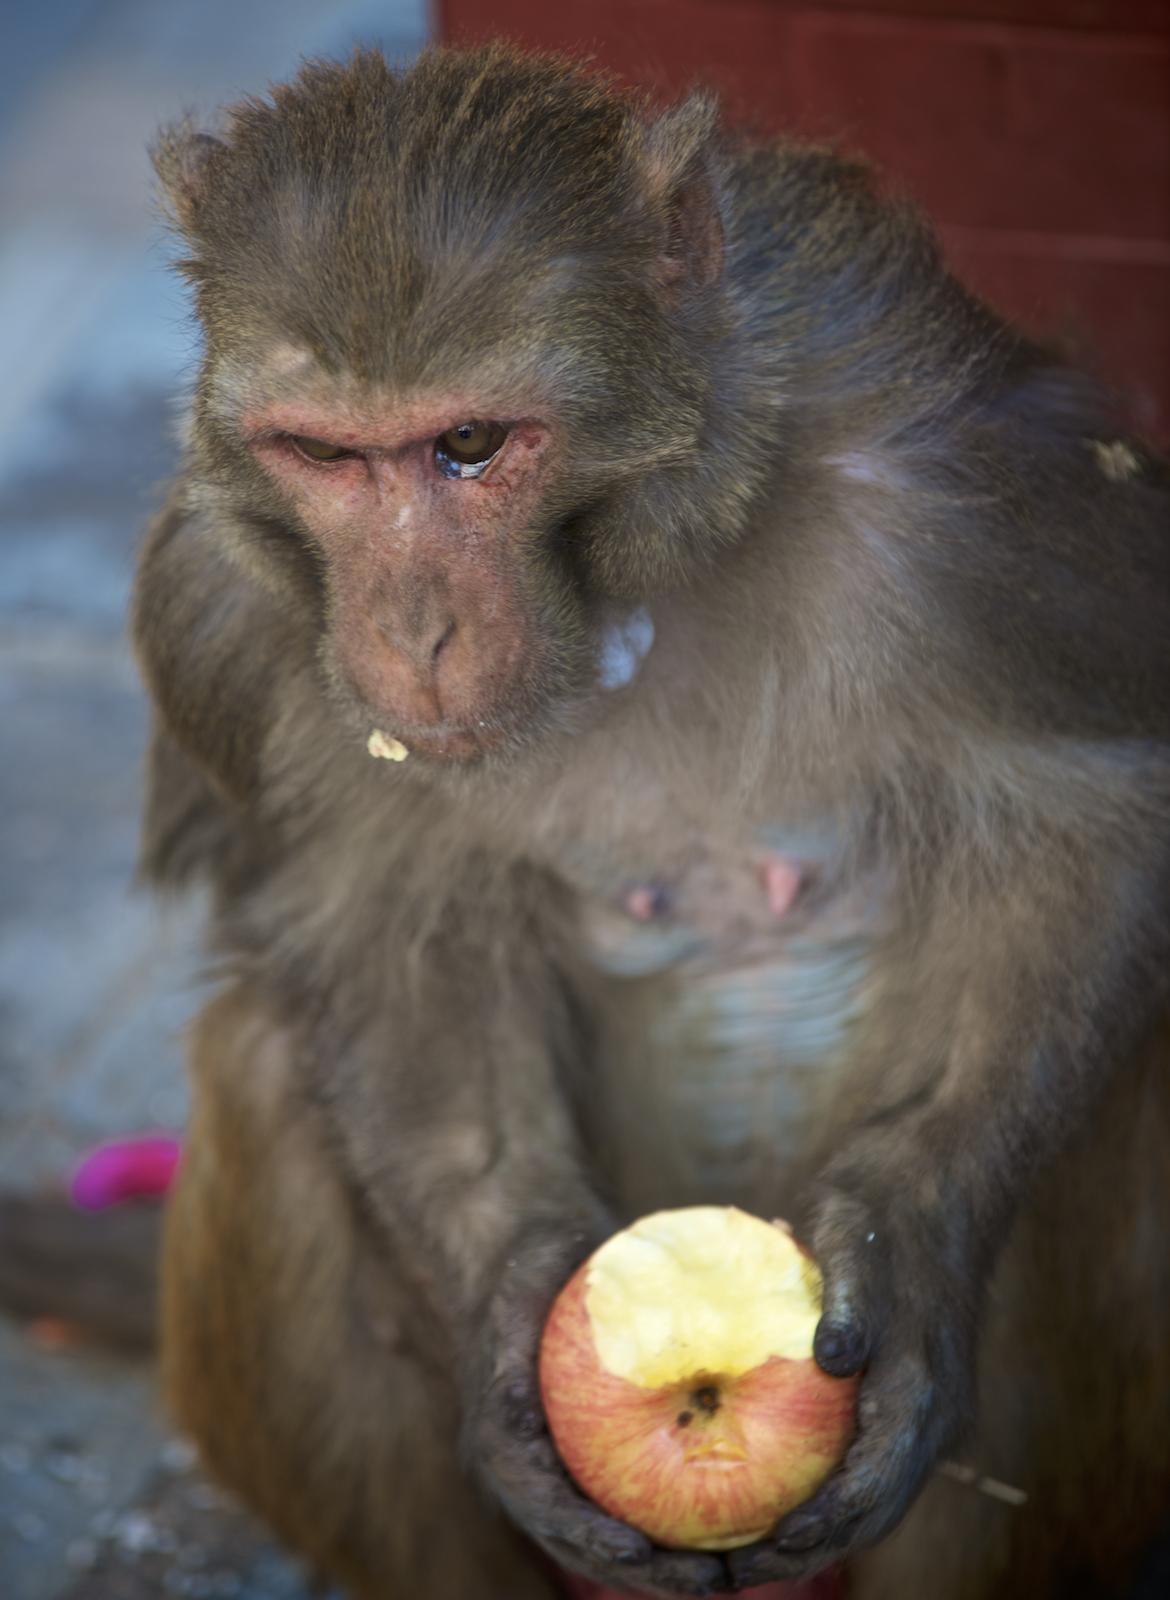 A monkey at Swayambhunath Temple in Kathmandu, Nepal.  Image by New Orleans based travel photographer, Marc Pagani - marcpagani.com